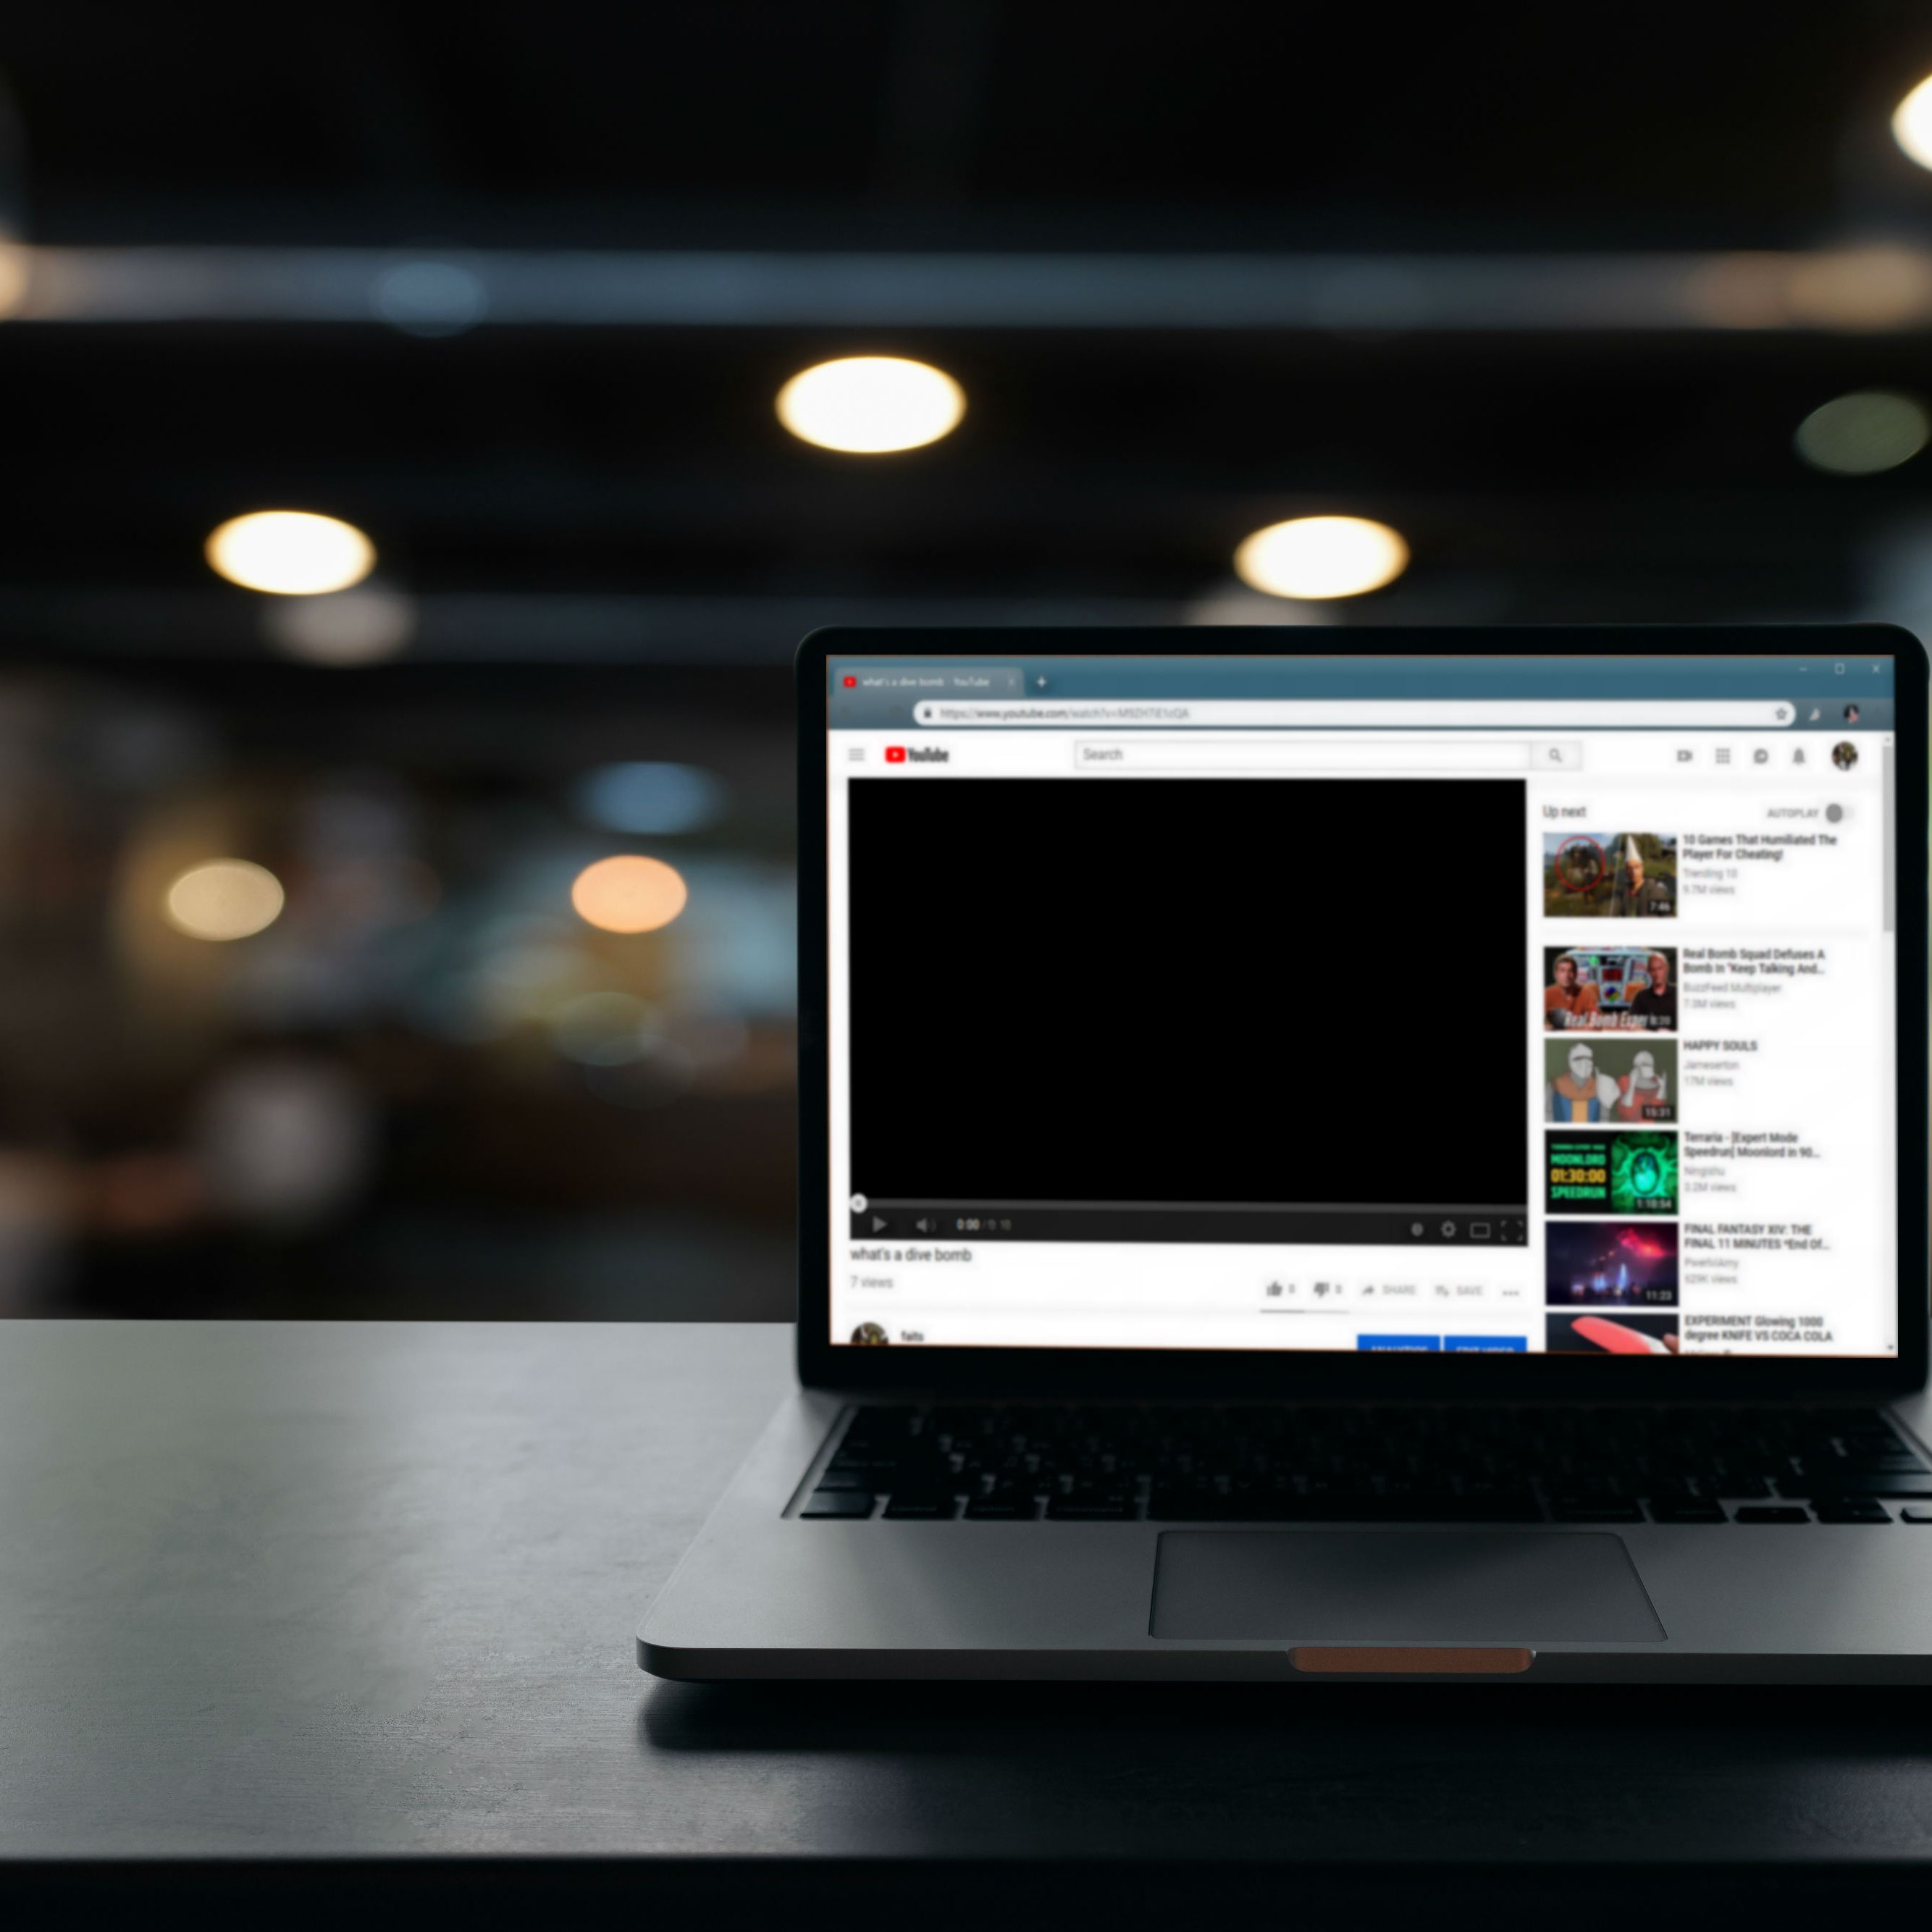 How to Fix a YouTube Black Screen